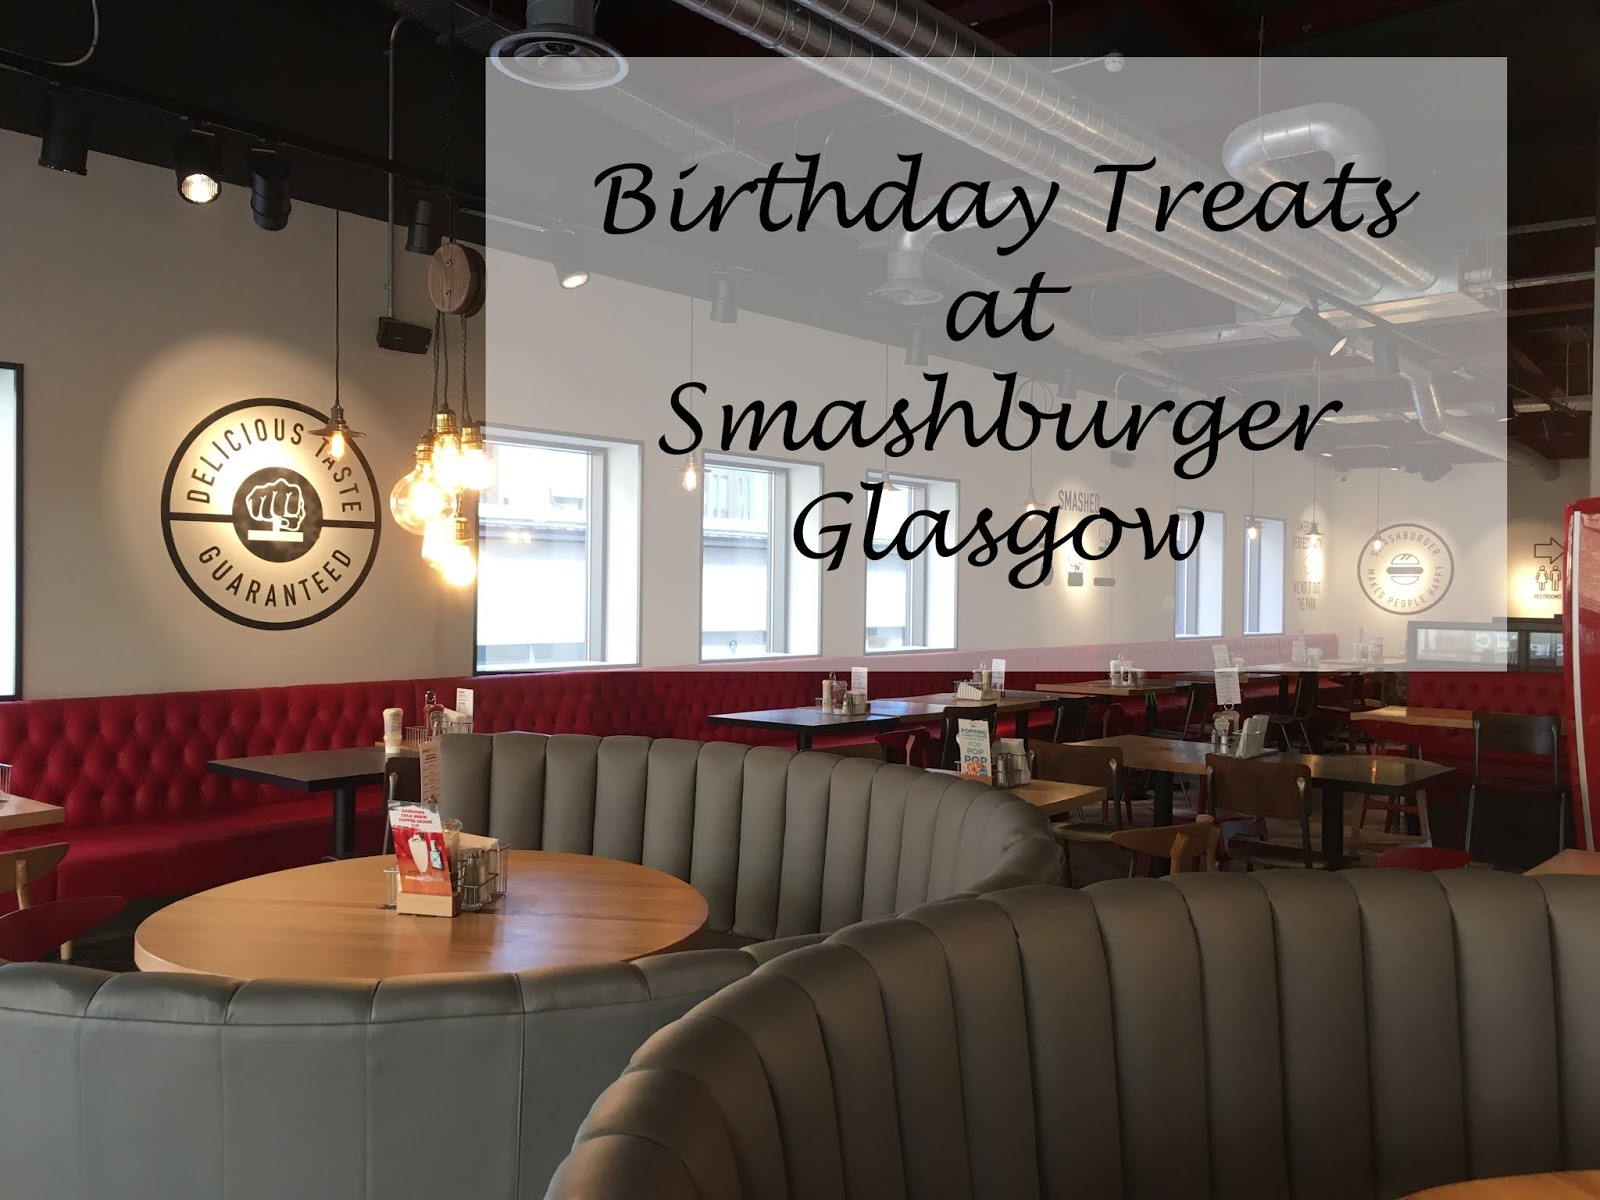 Birthday Treats at Smashburger, Glasgow!